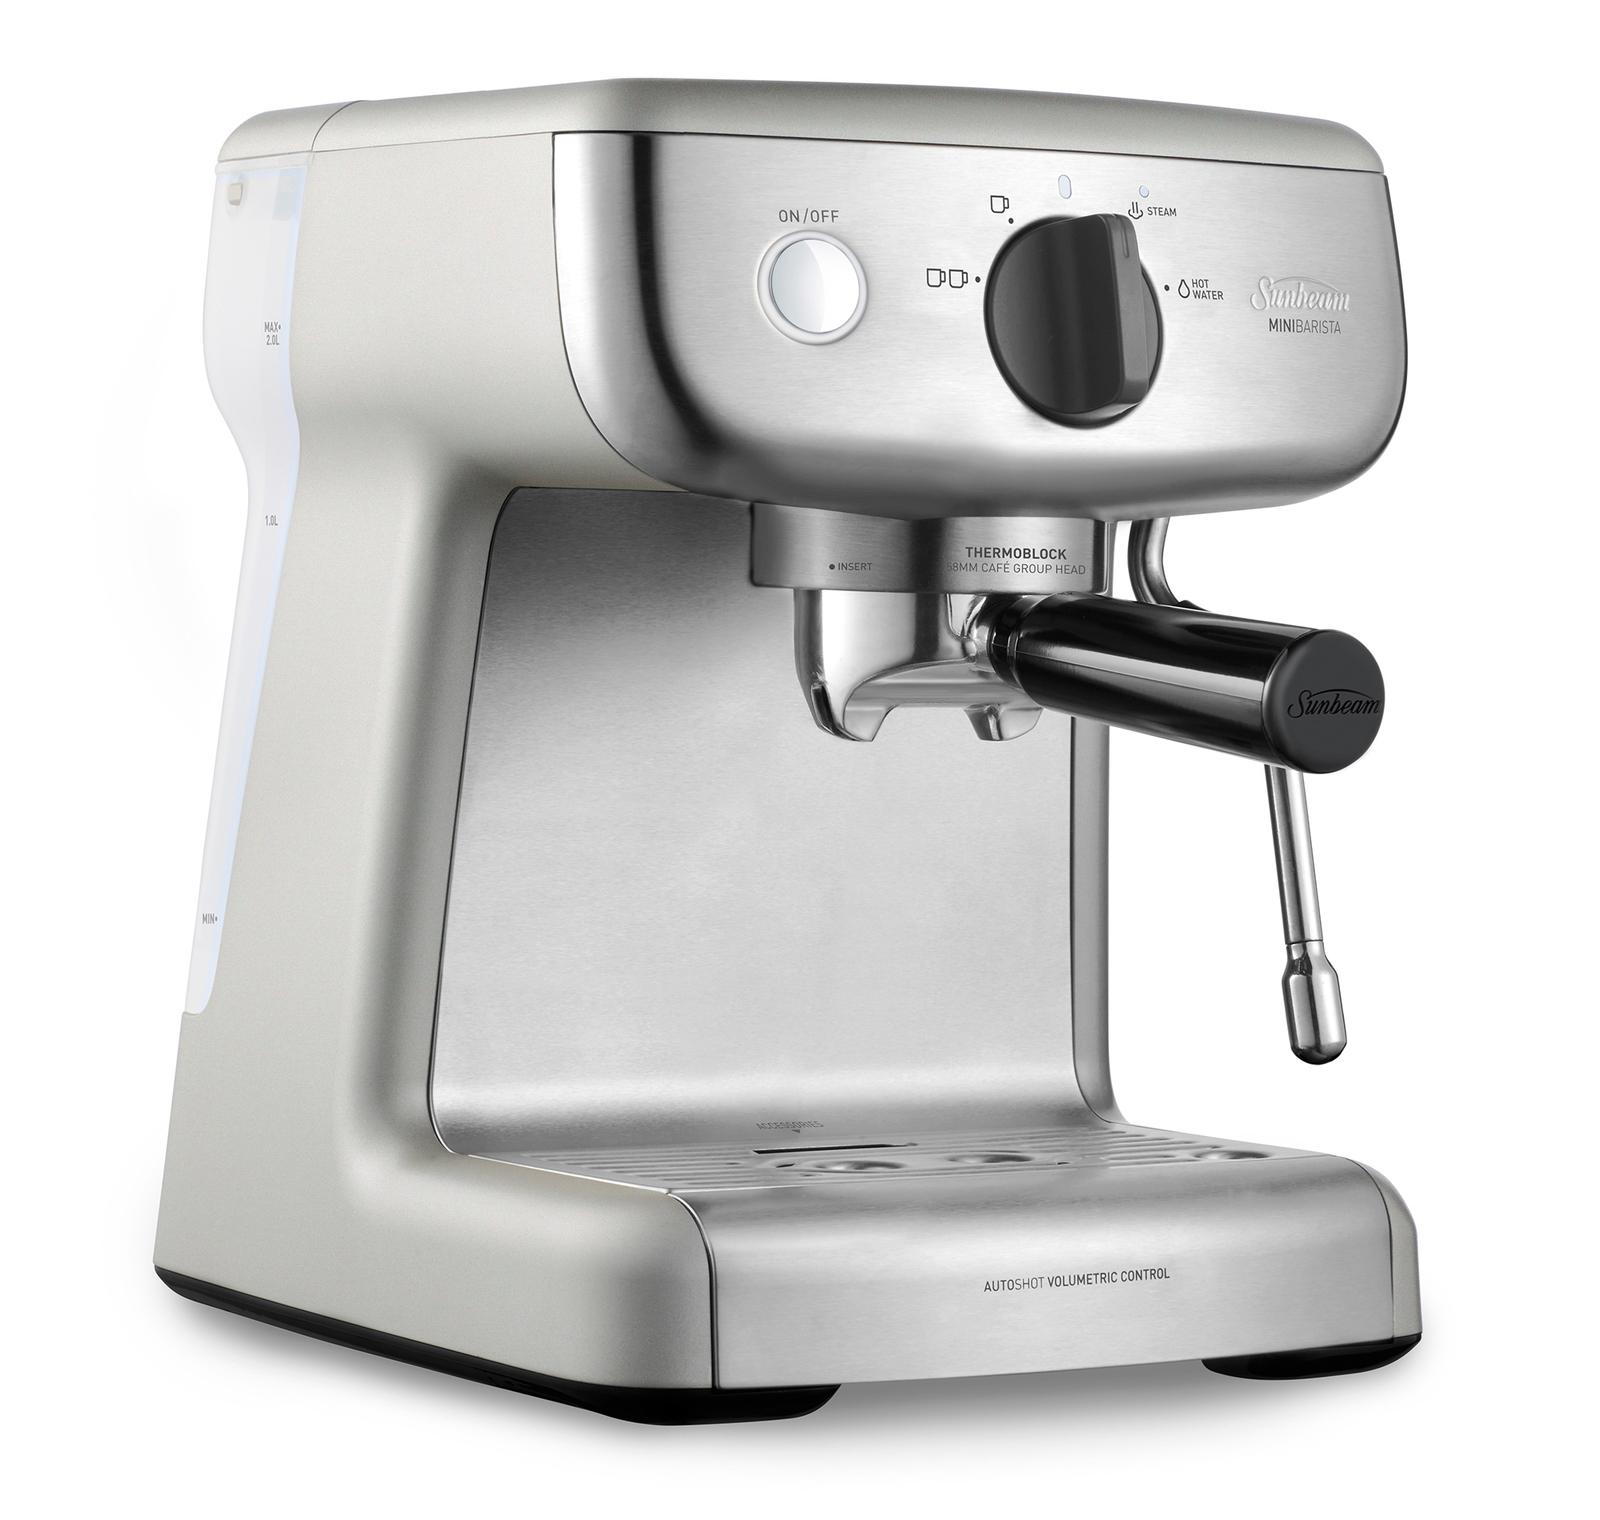 Sunbeam: Mini Barista Espresso Machine image